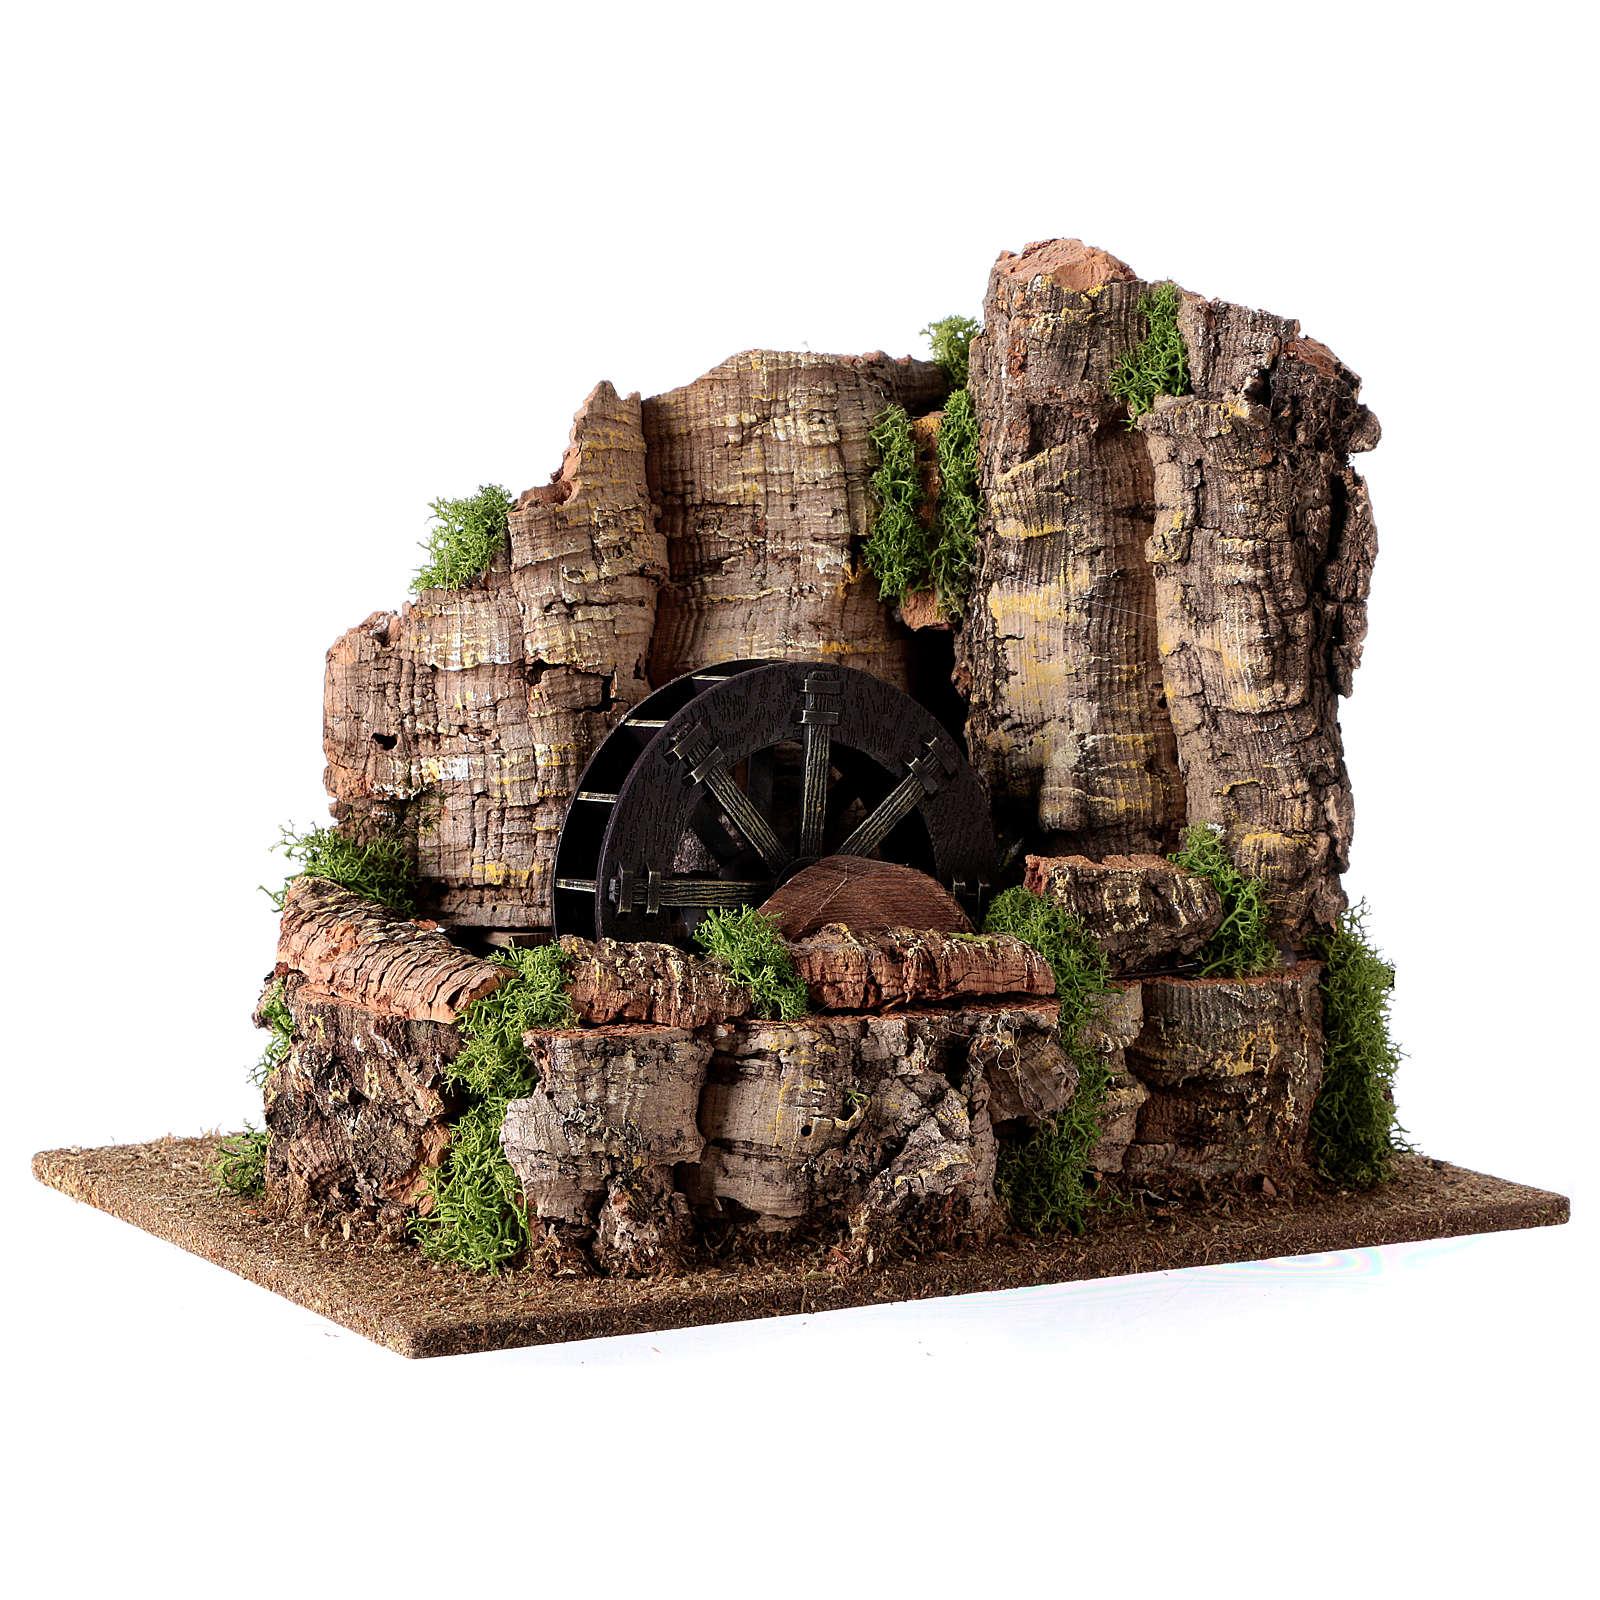 Water mill in rocky setting for Nativity scene 25x30x20 cm 4